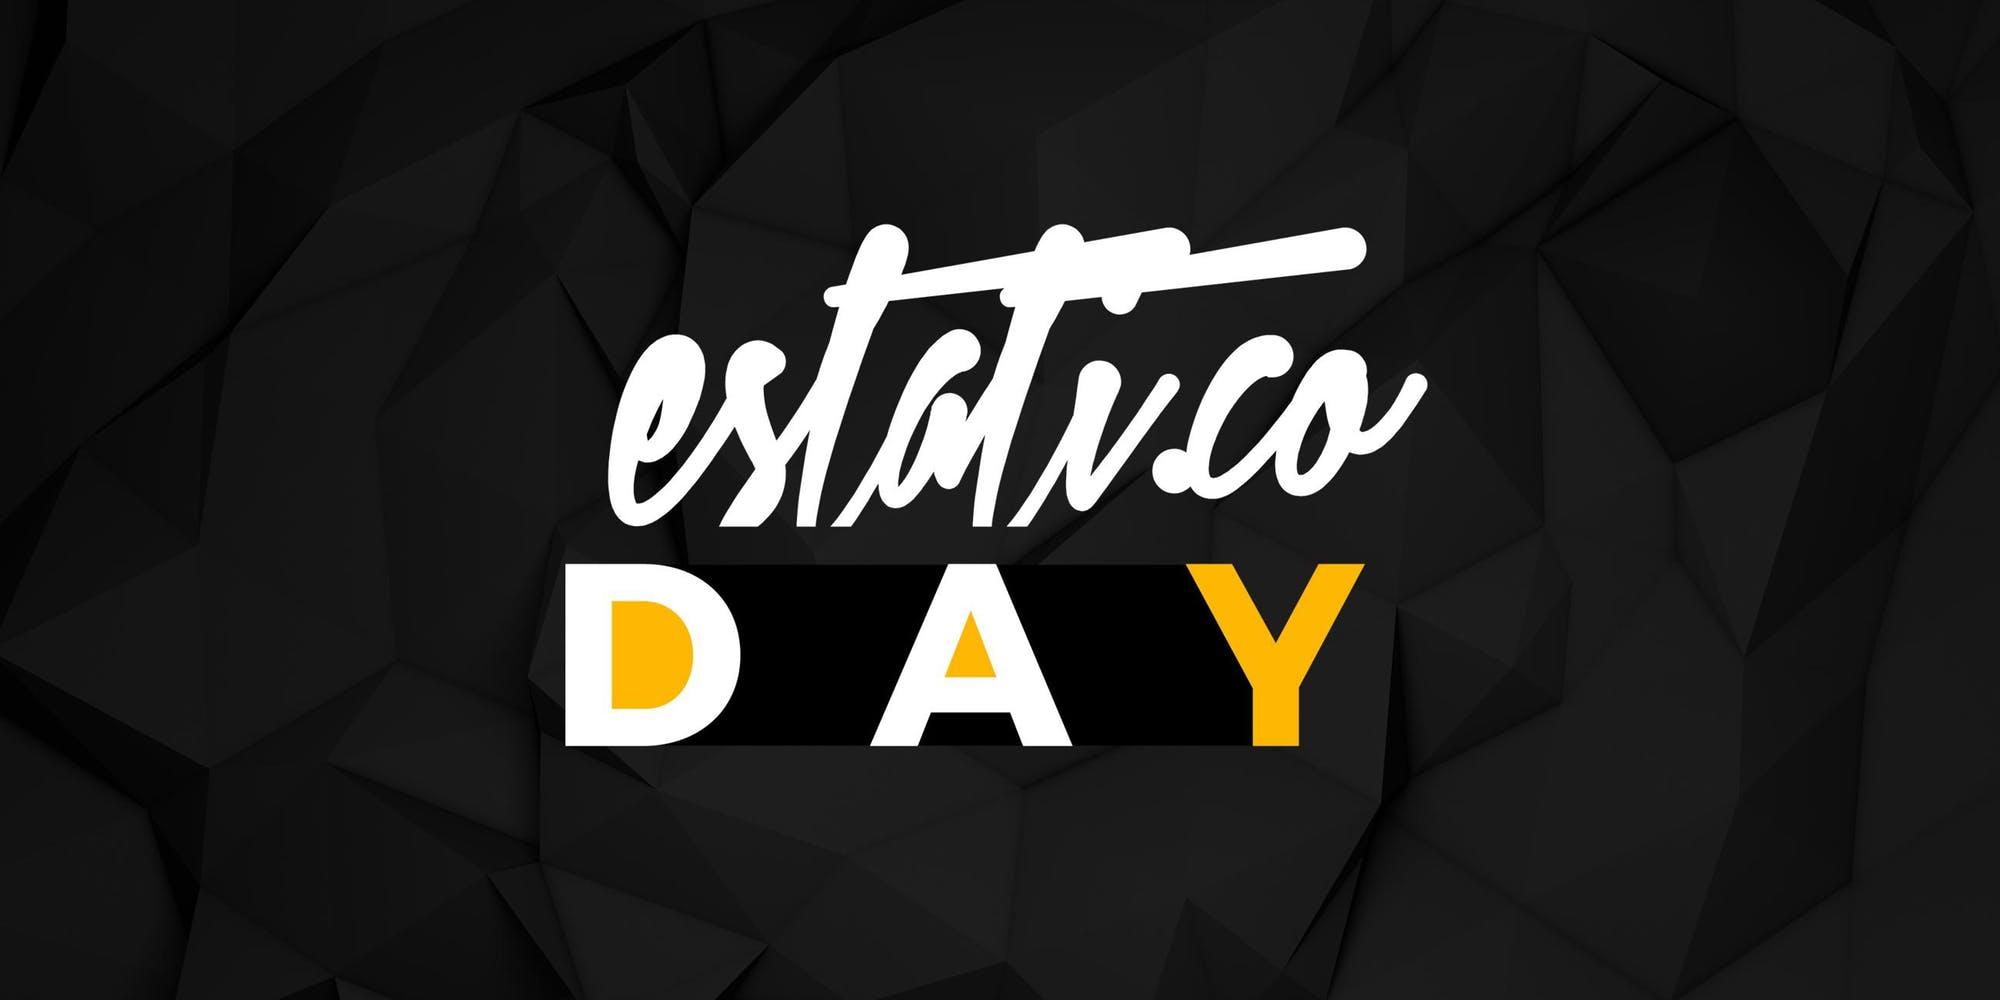 estati.co DAY, encuentro de marketing digital